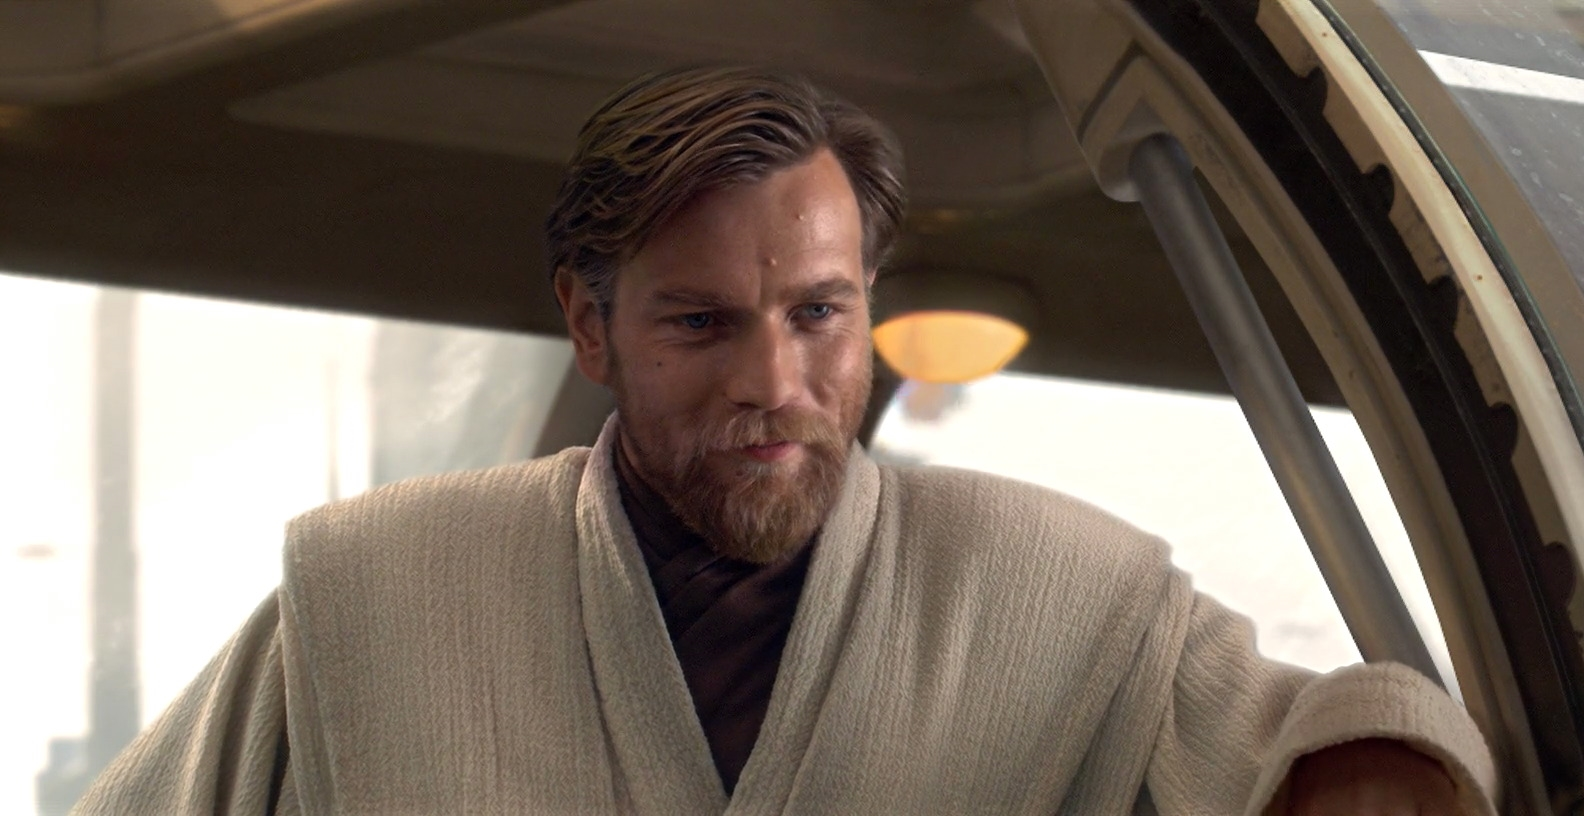 Obi Wan Kenobi Actor Ewan McGregor Is Game ...